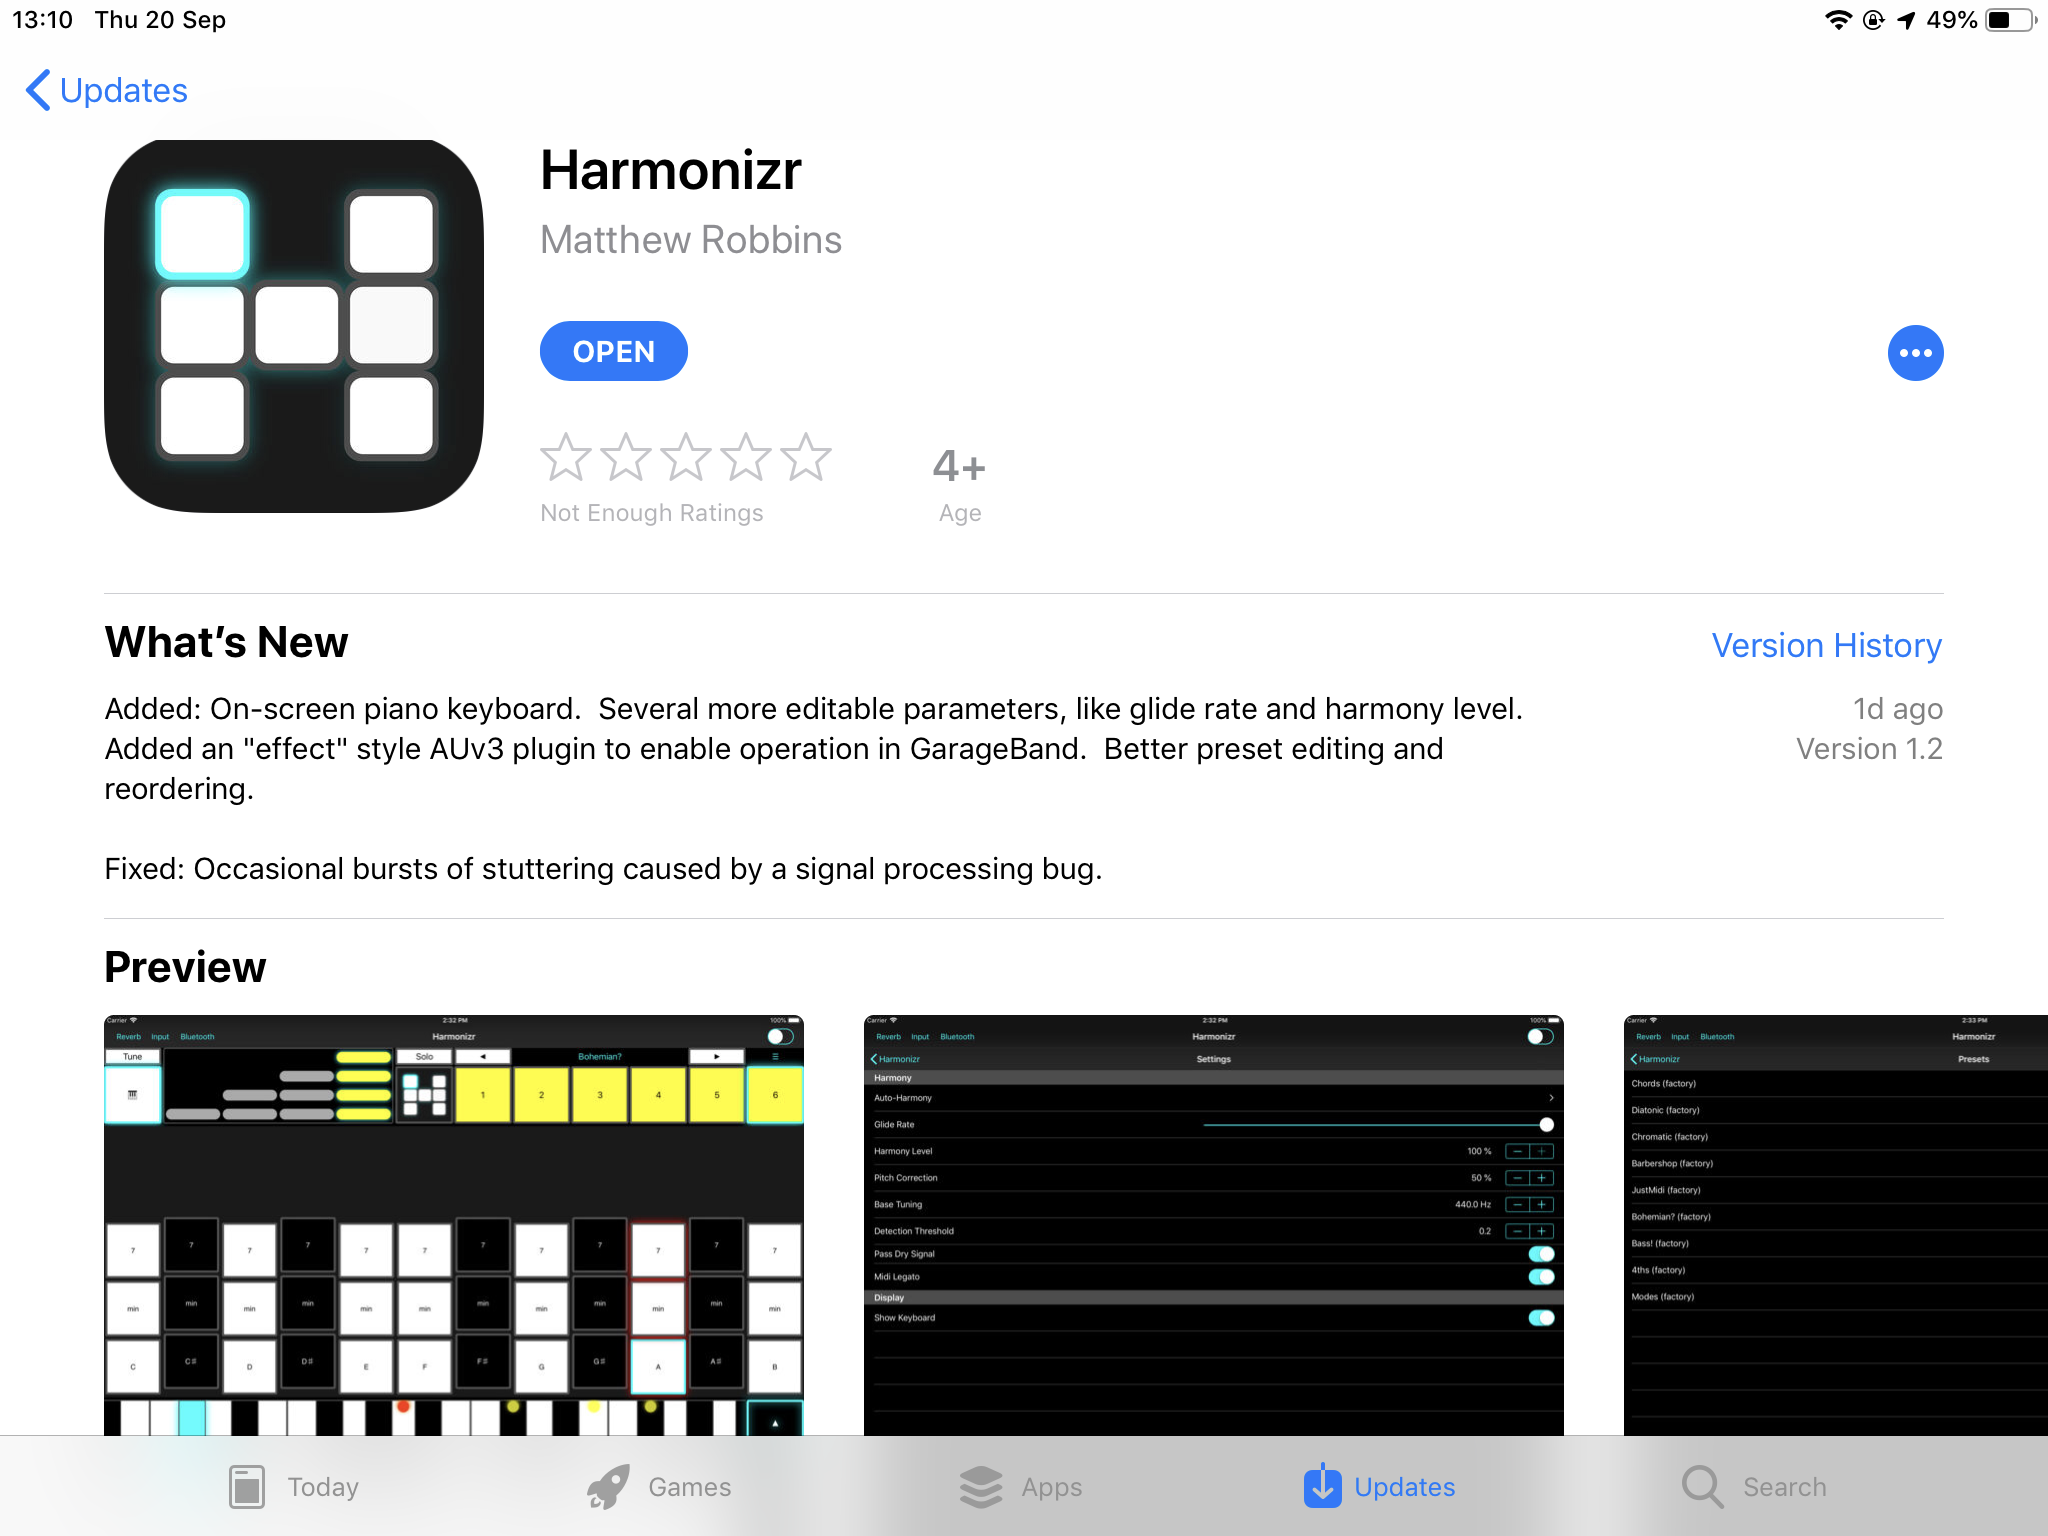 Harmonizr Goes AU3 for GarageBand — Audiobus Forum